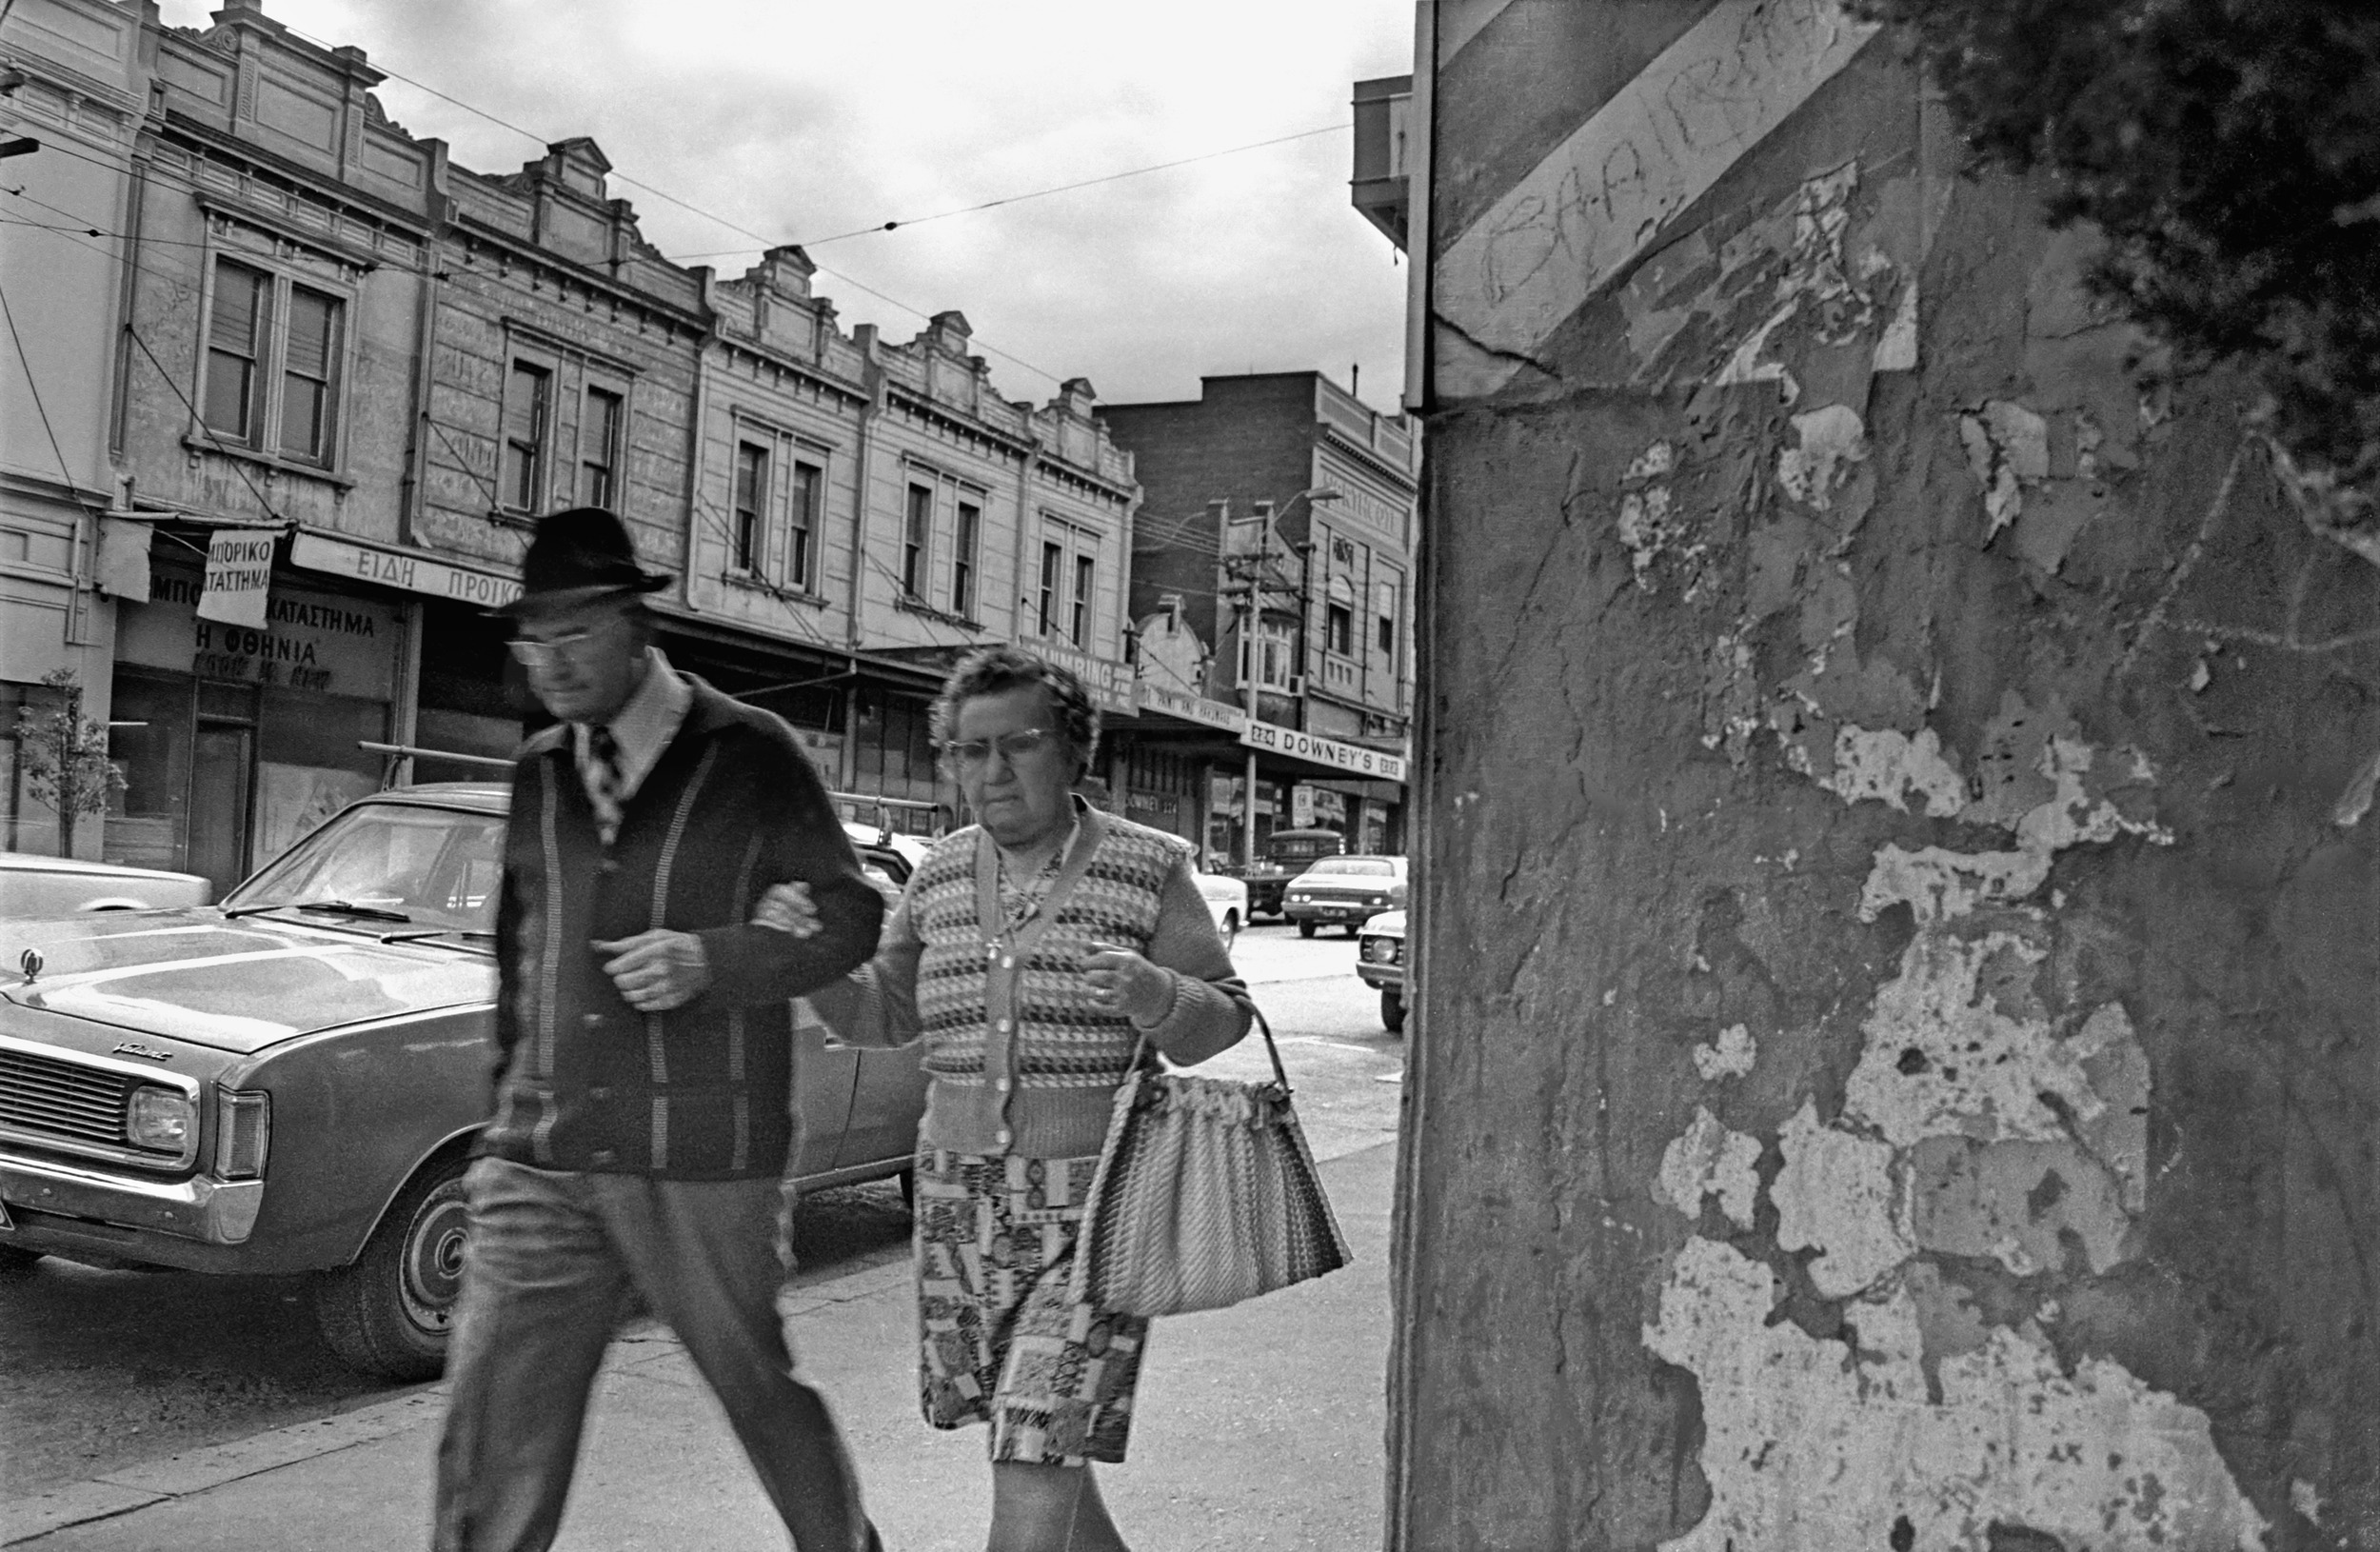 David Wadelton, 247 High Street Northcote, couple walking, 1976.